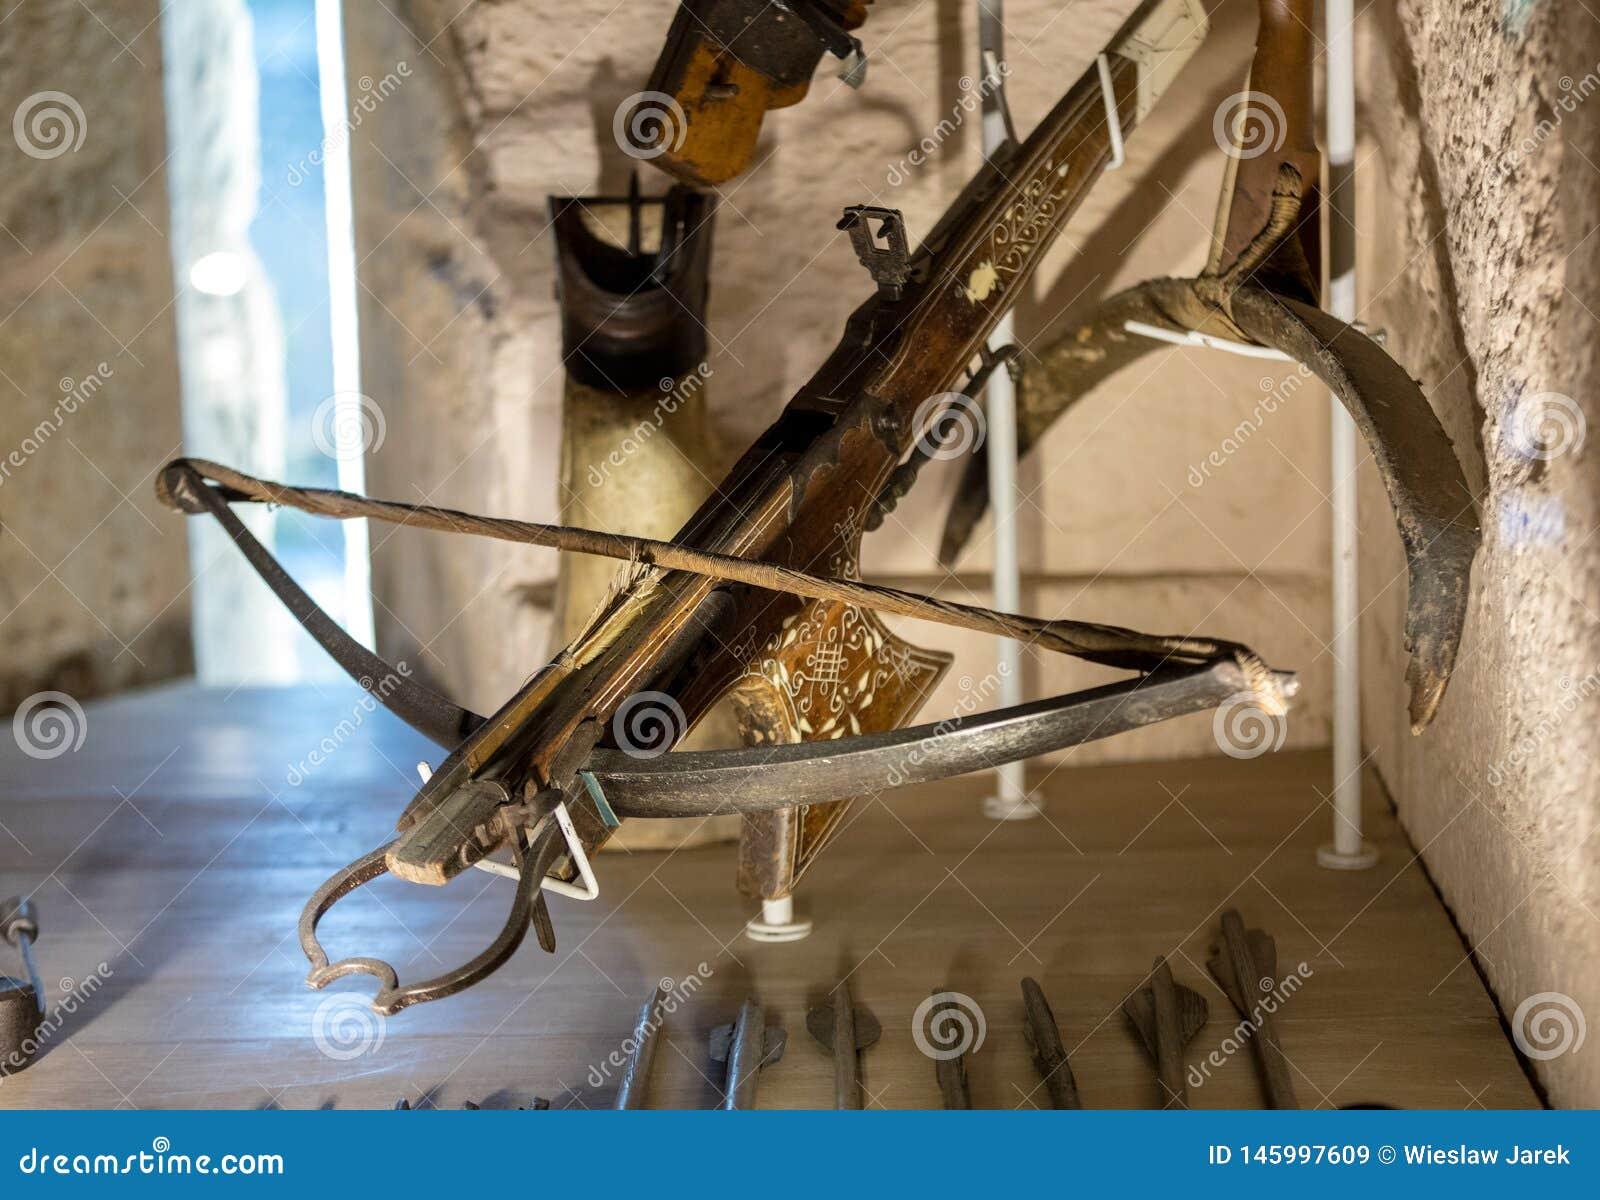 As bestas antigas indicaram nas salas do castelo de Castelnaud fortaleza medieval no Castelnaud-la-Chapelle, Dordogne, Aquitaine,